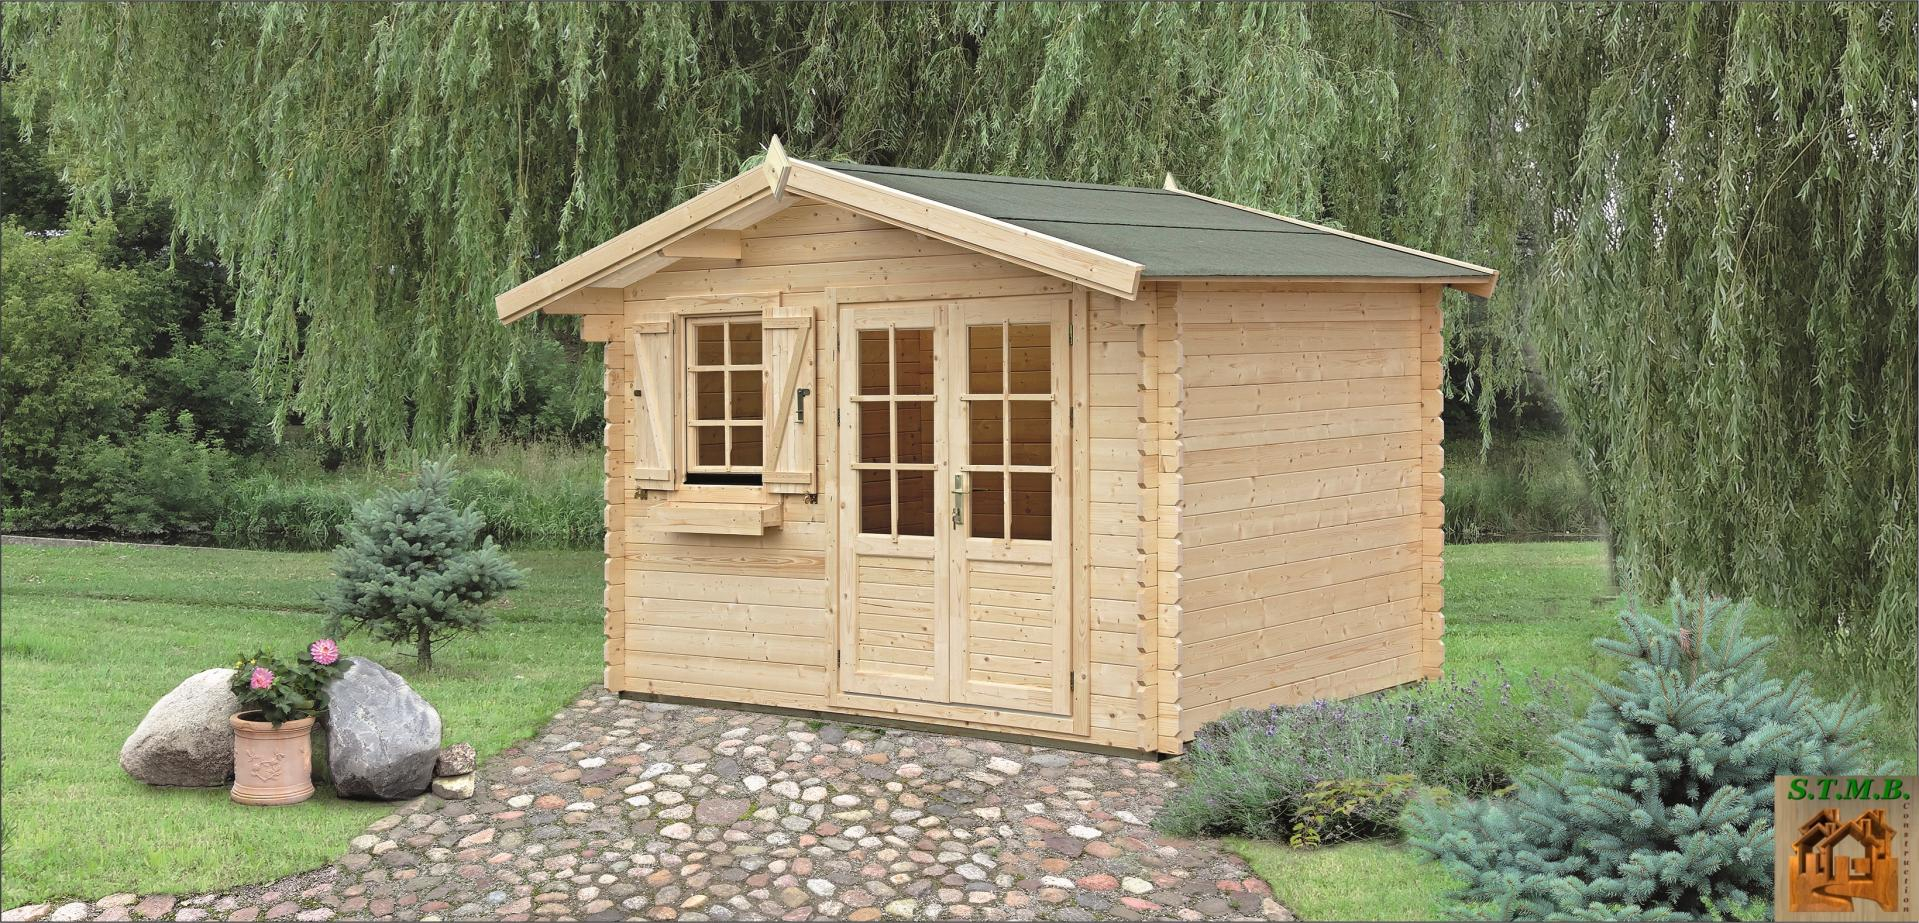 Abri De Jardin Habitable abri de jardin habitable kit cabane en bois jardin - idees